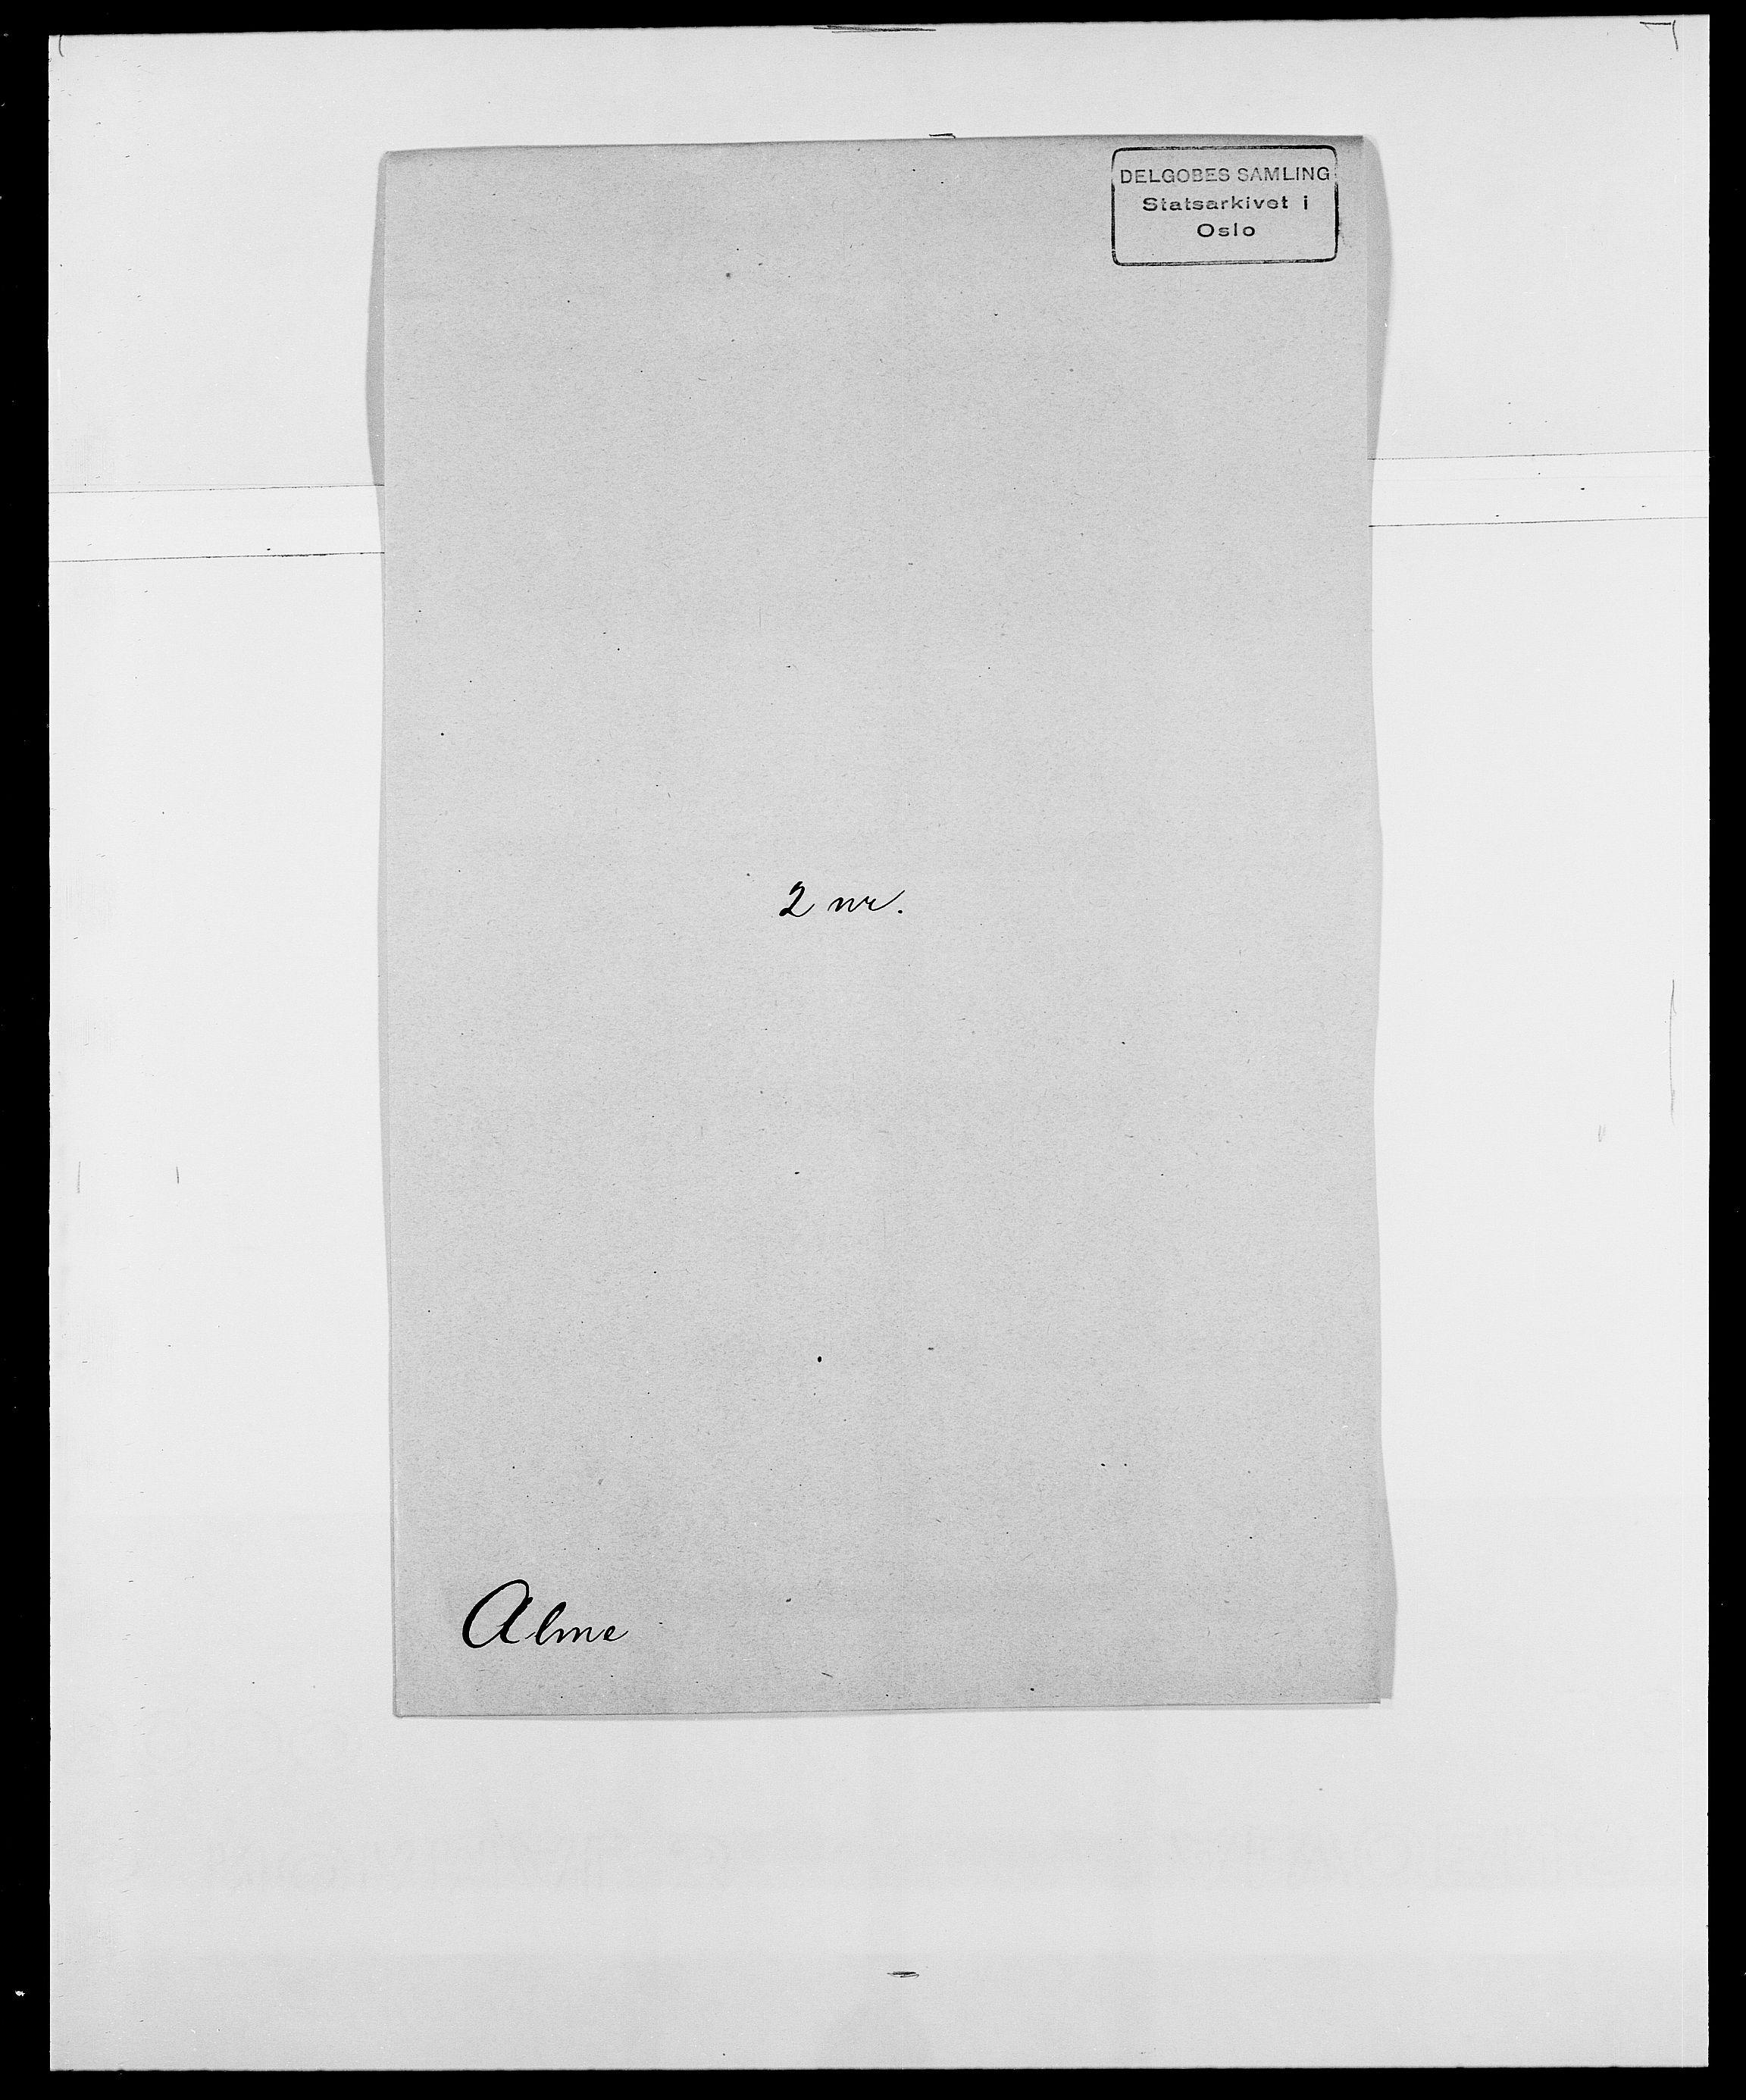 SAO, Delgobe, Charles Antoine - samling, D/Da/L0001: Aabye - Angerman, s. 437